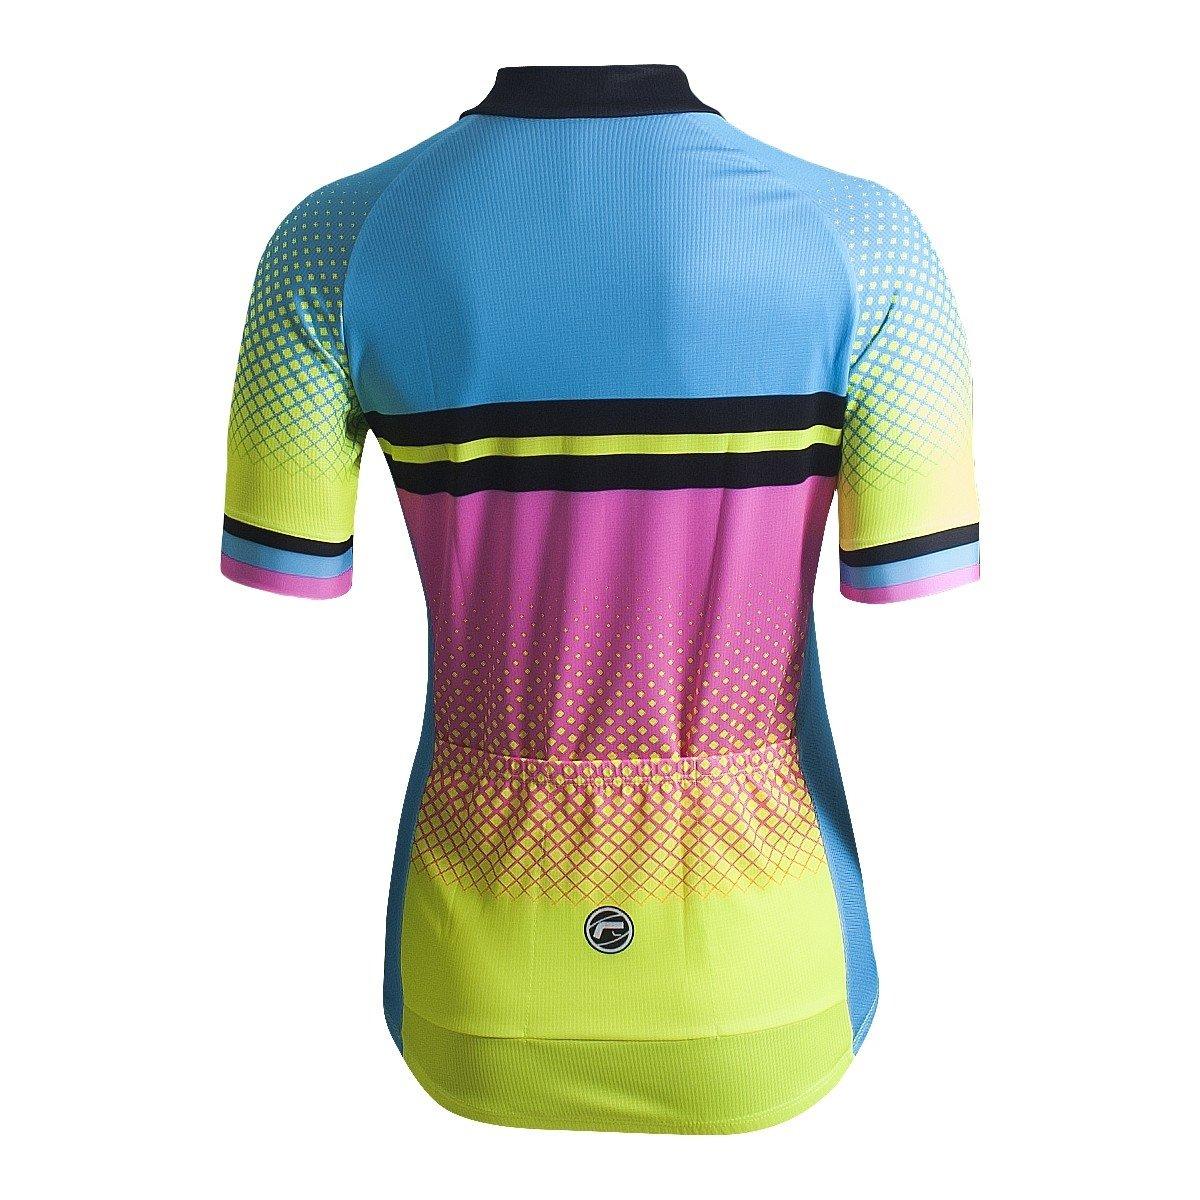 Camisa GB Fem Spectre Azul Pink Spectre GB Azul Pink Camisa e Spectre Fem Camisa e GB 04wvqzfY